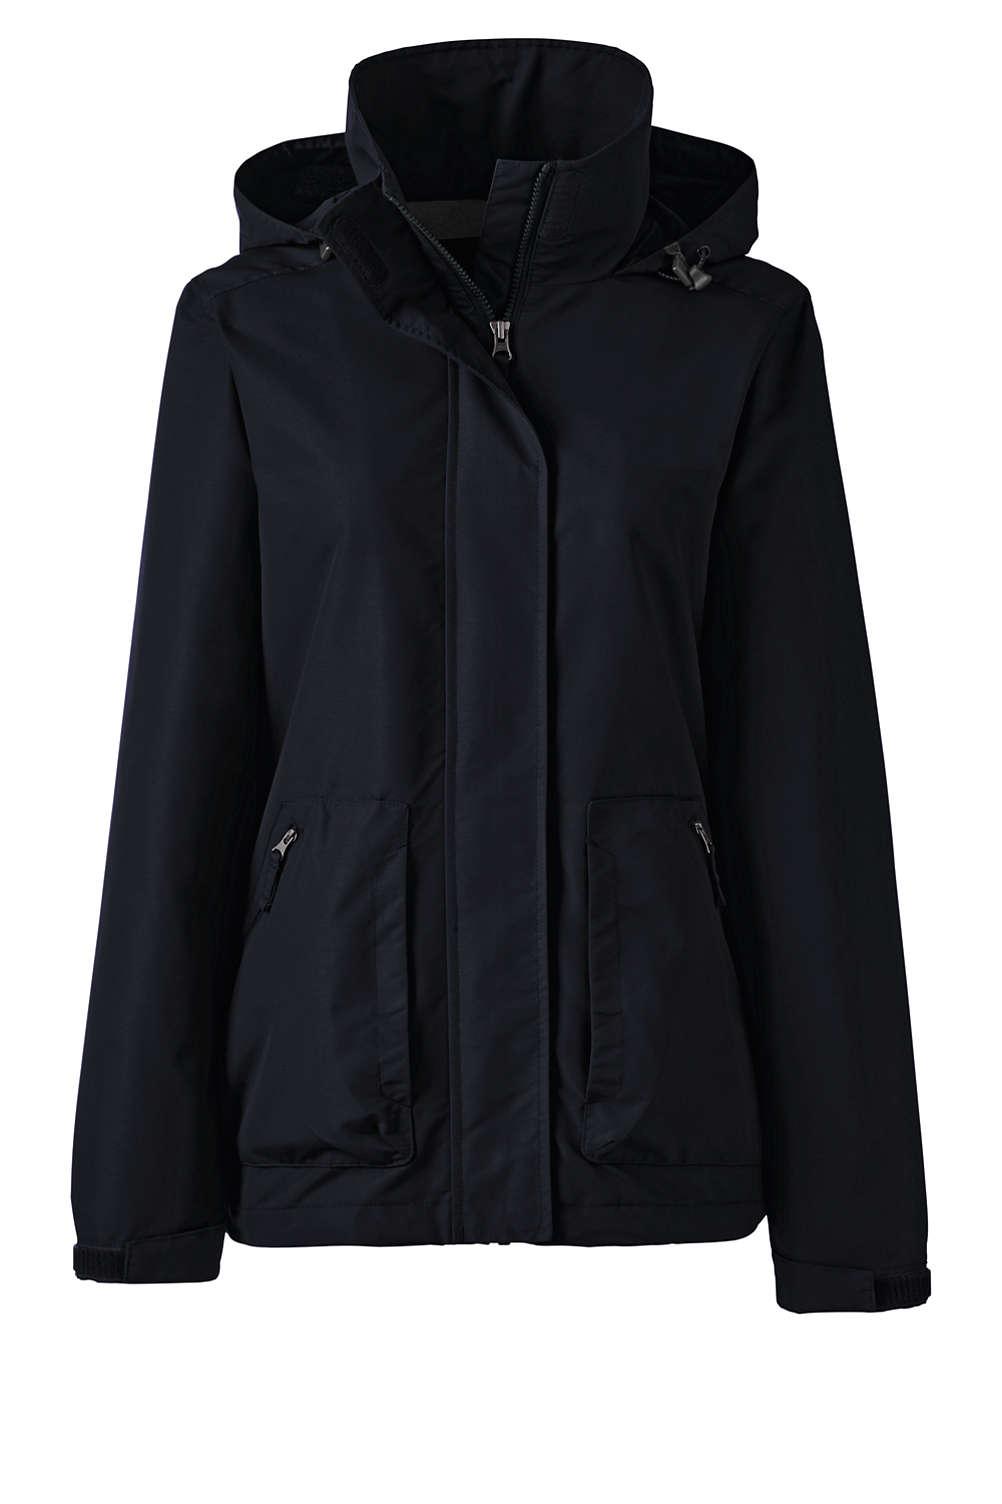 bb51e14ad53 School Uniform Women's Outrigger Fleece Lined Jacket